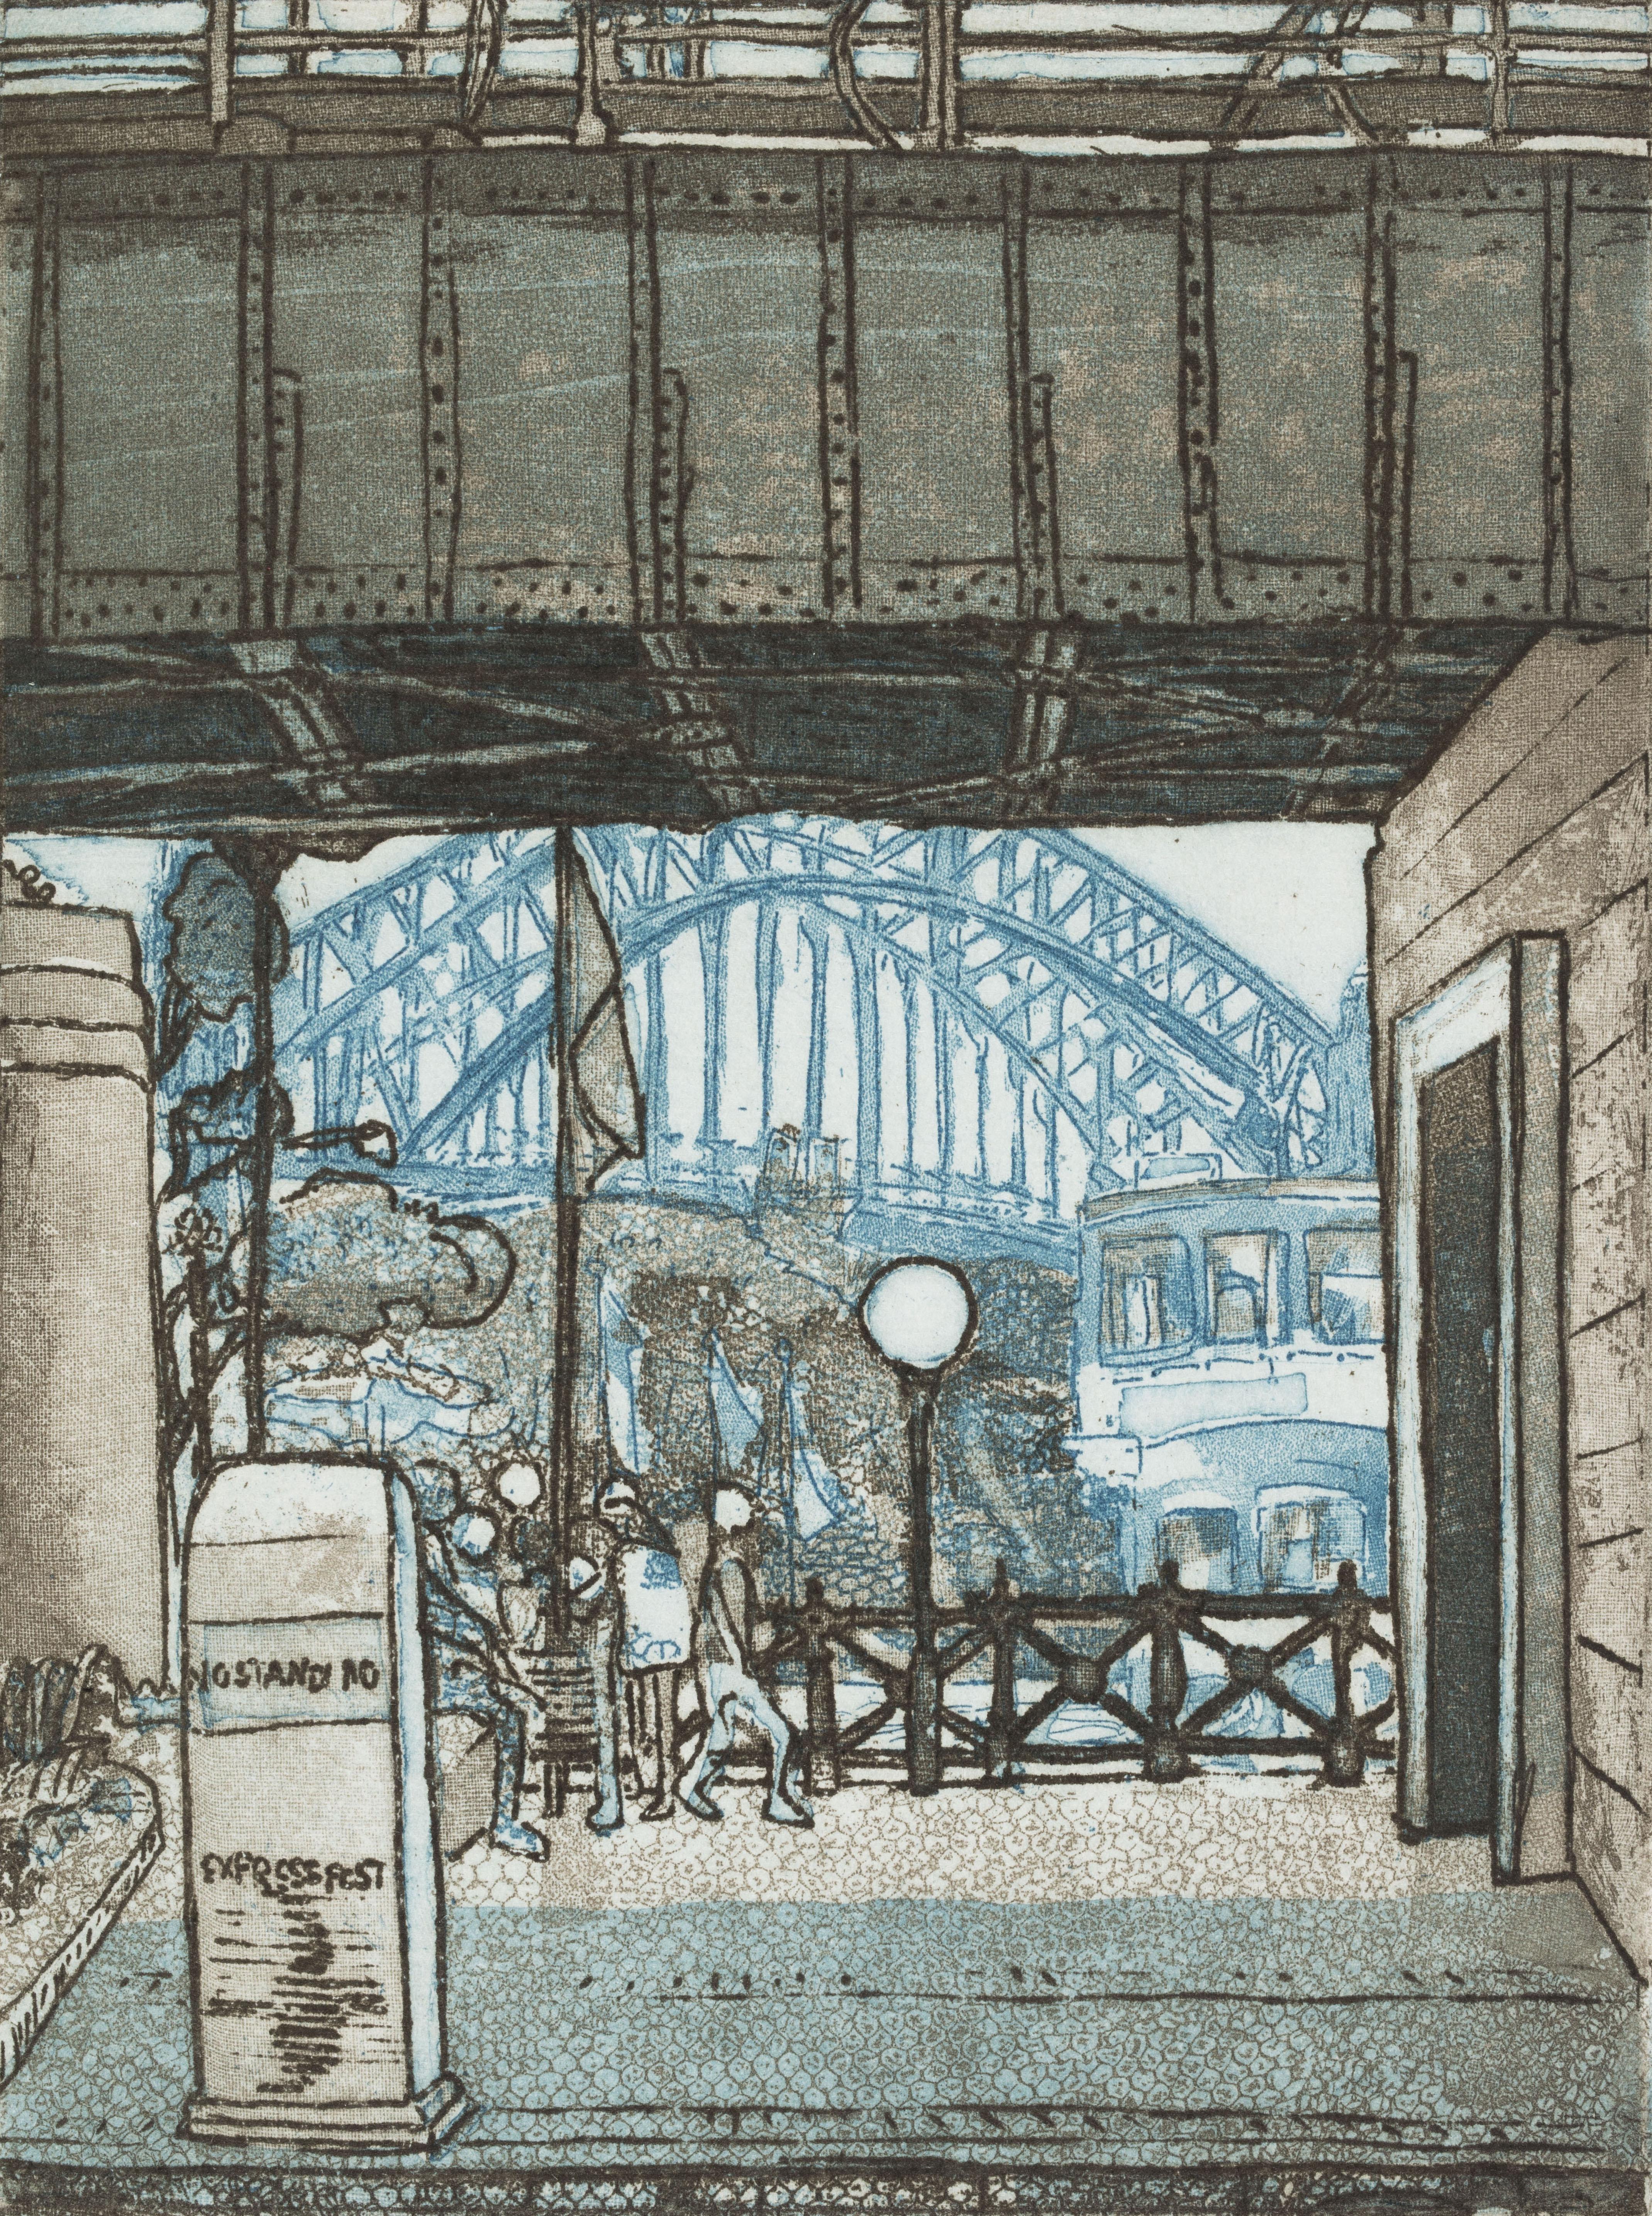 Sydney–Circular Quay: limited edition original prints etchings, by Barbara A Davidson